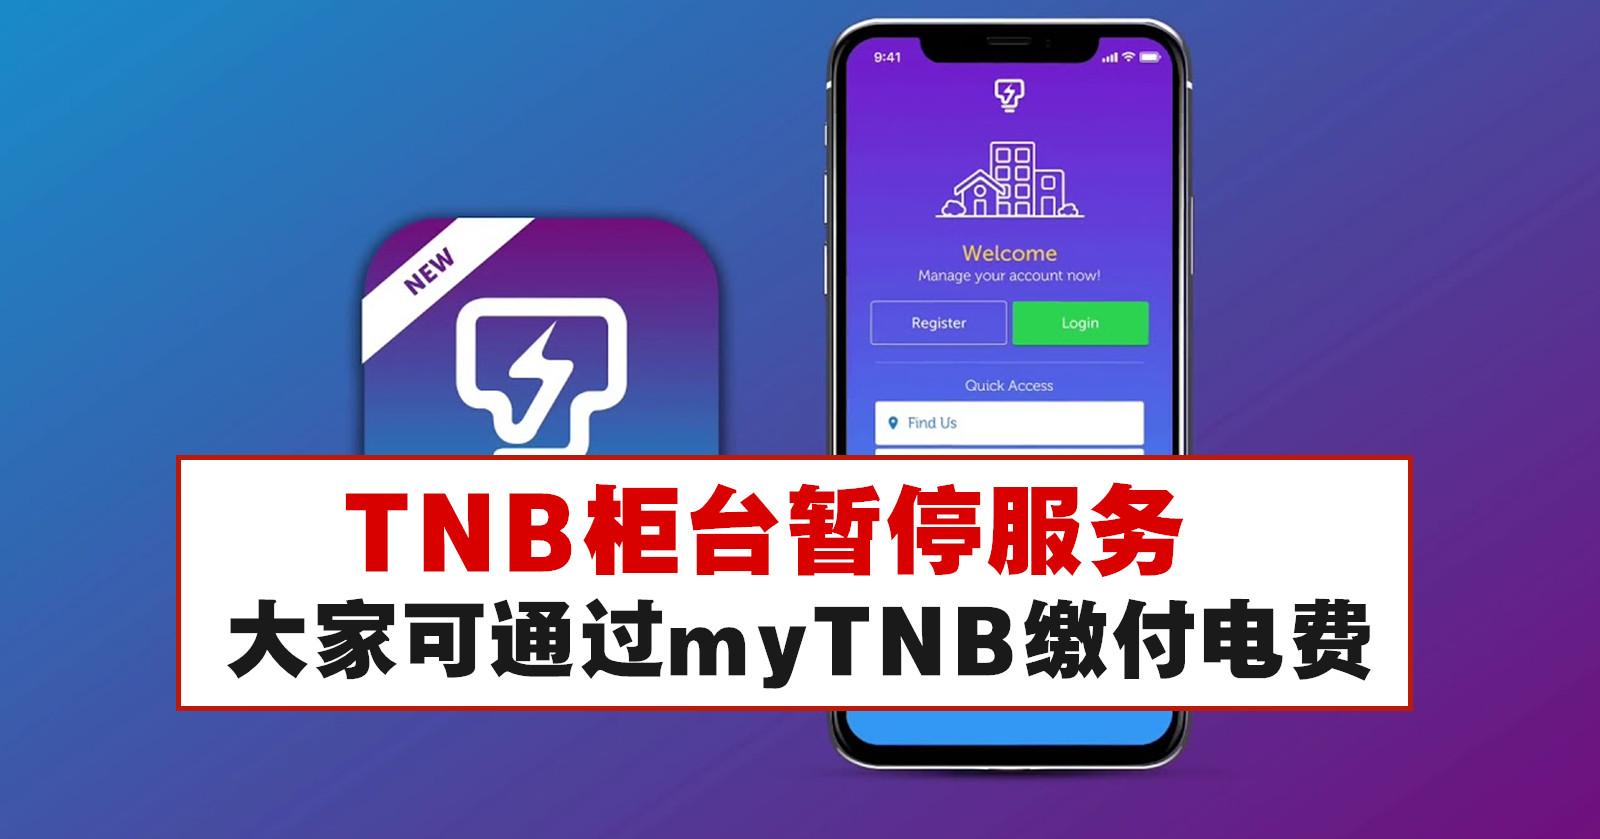 TNB柜台暂停服务,大家可通过myTNB缴付电费